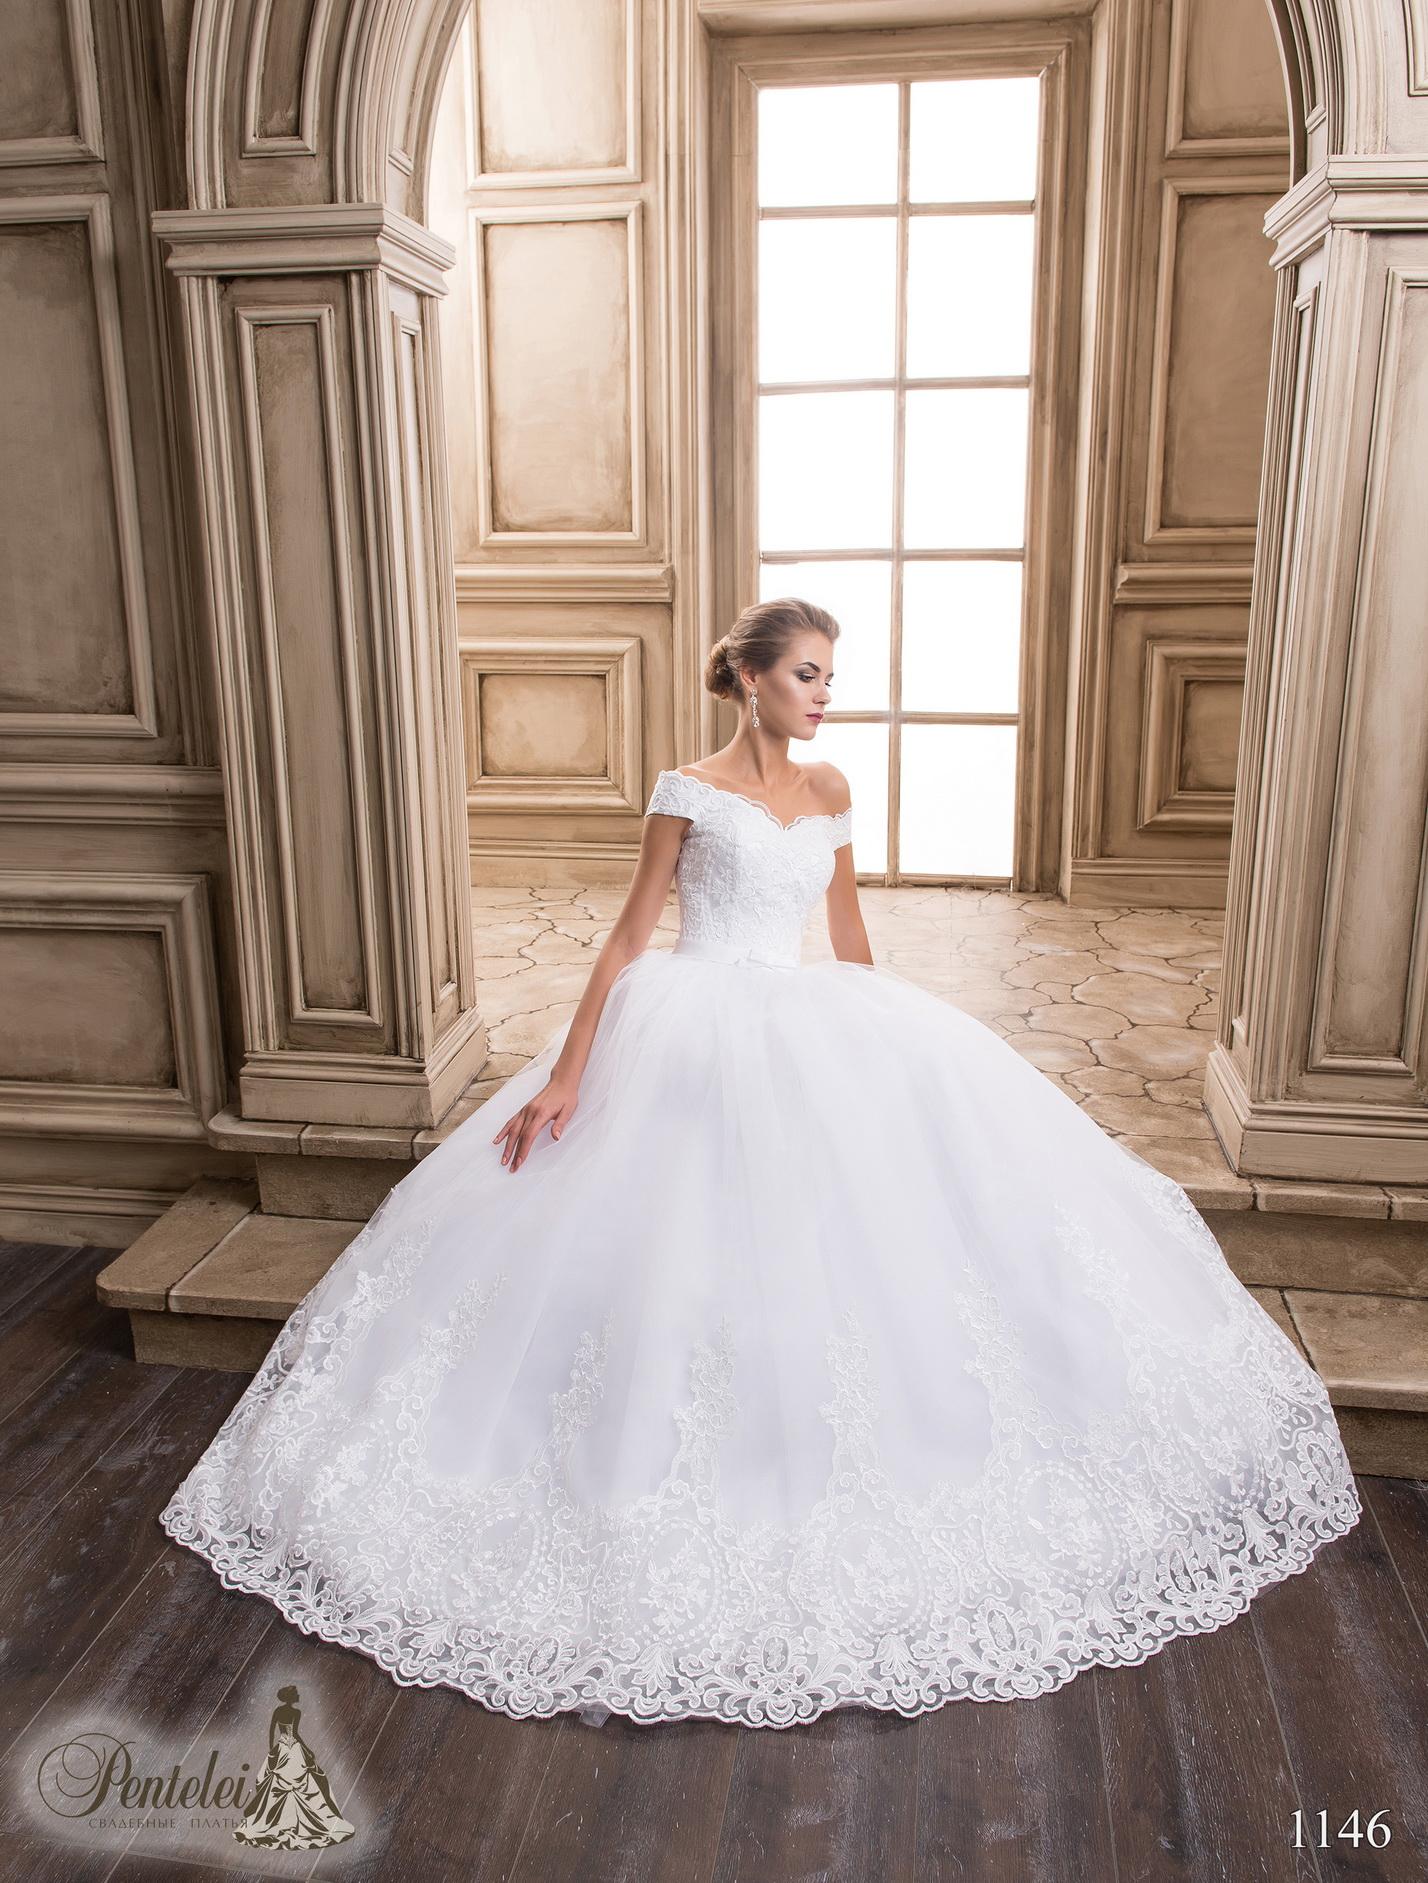 1146 | Buy wedding dresses wholesale from Pentelei